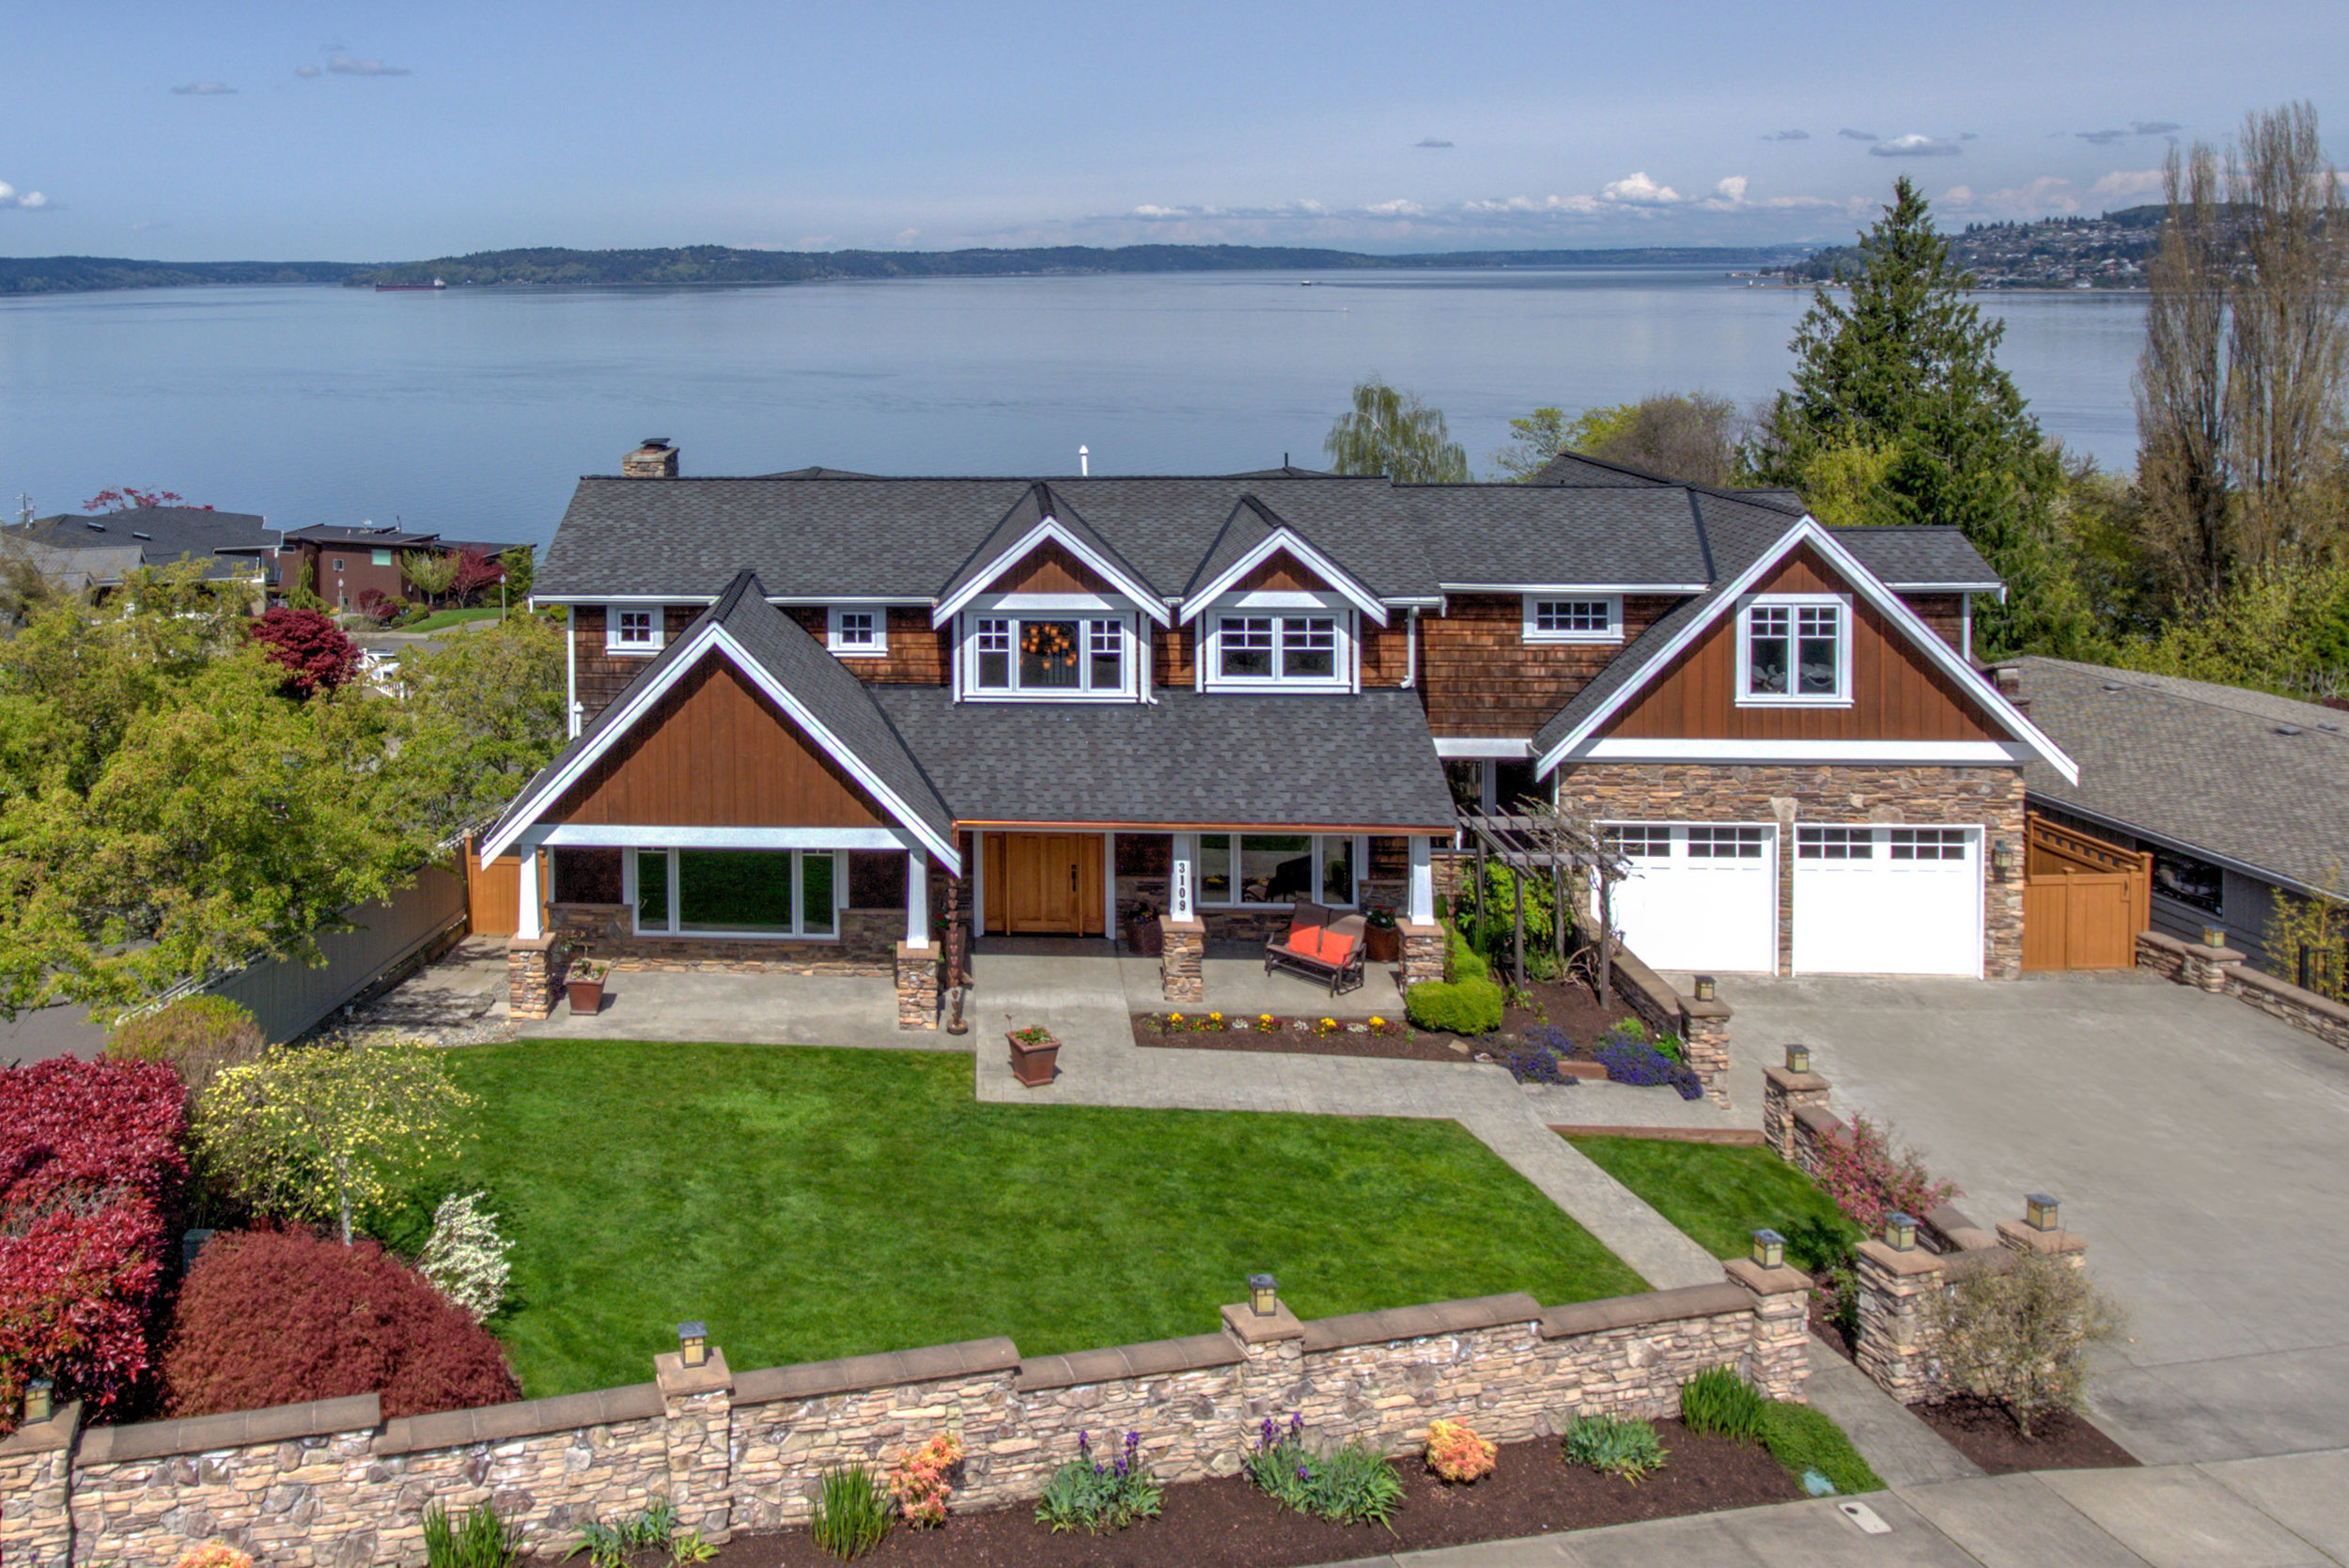 3109 N 33rd St, Tacoma | $1,945,000